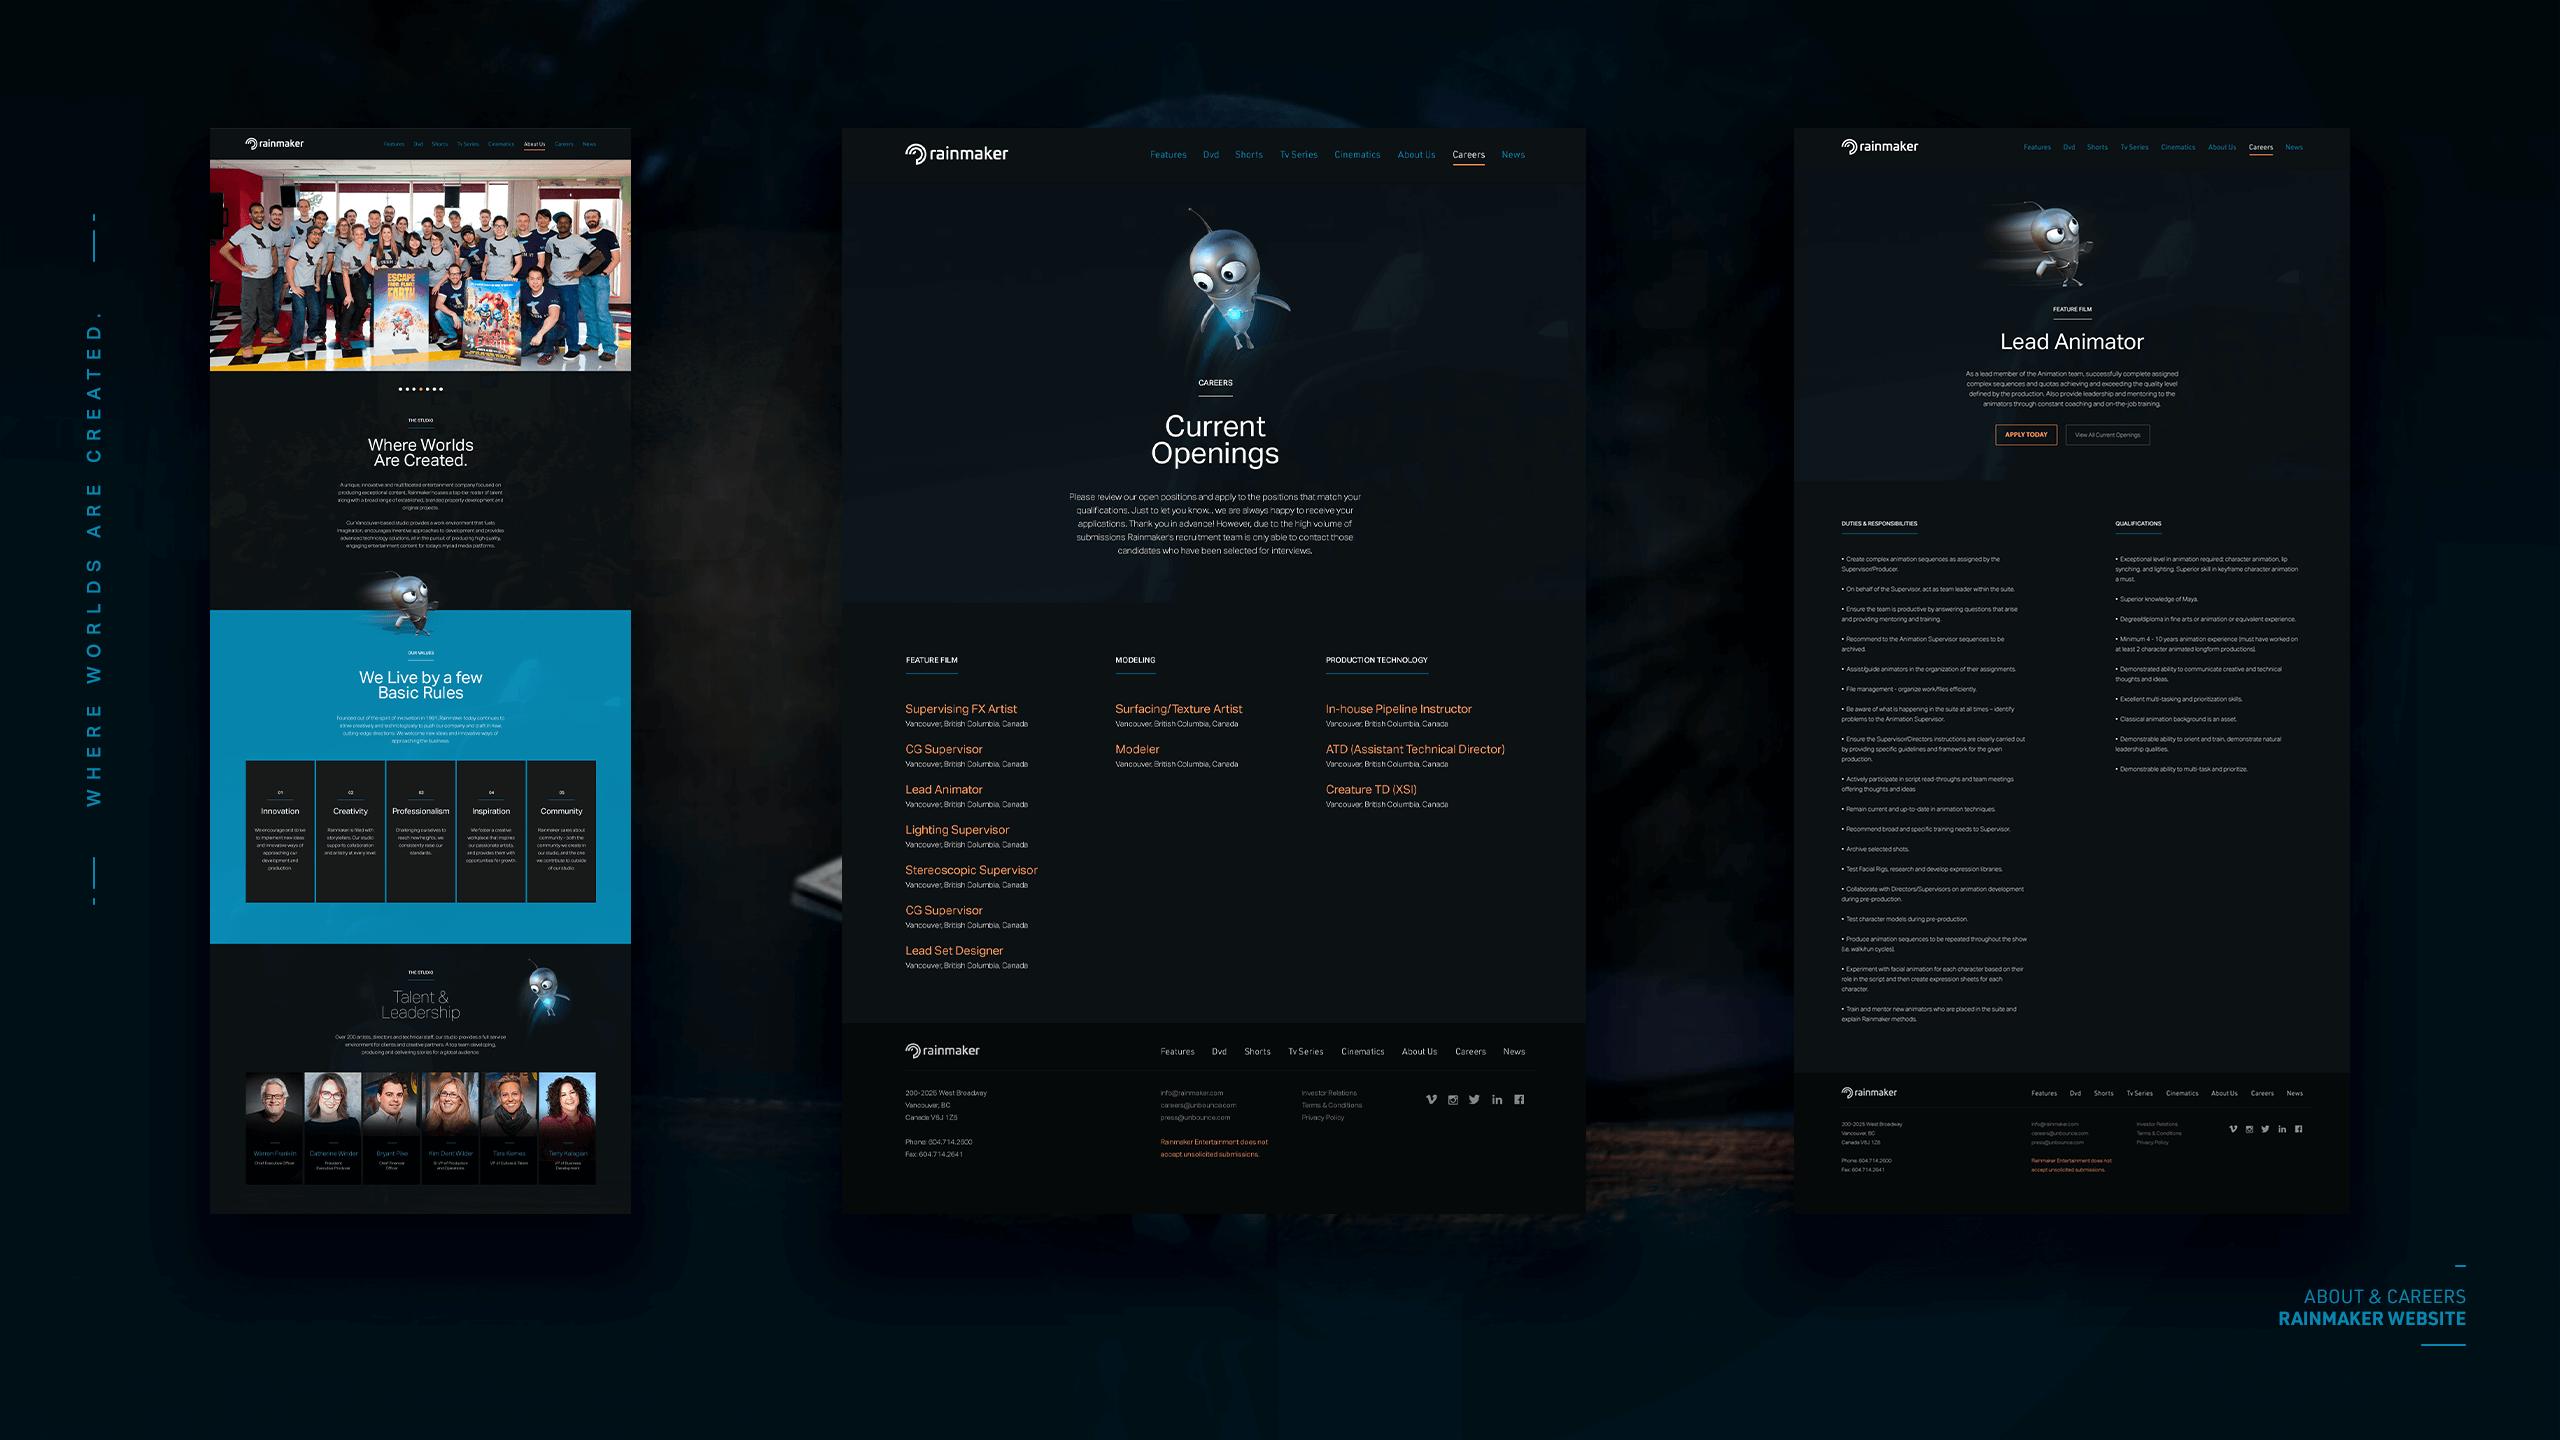 rainmaker-website-desktop-about-careers